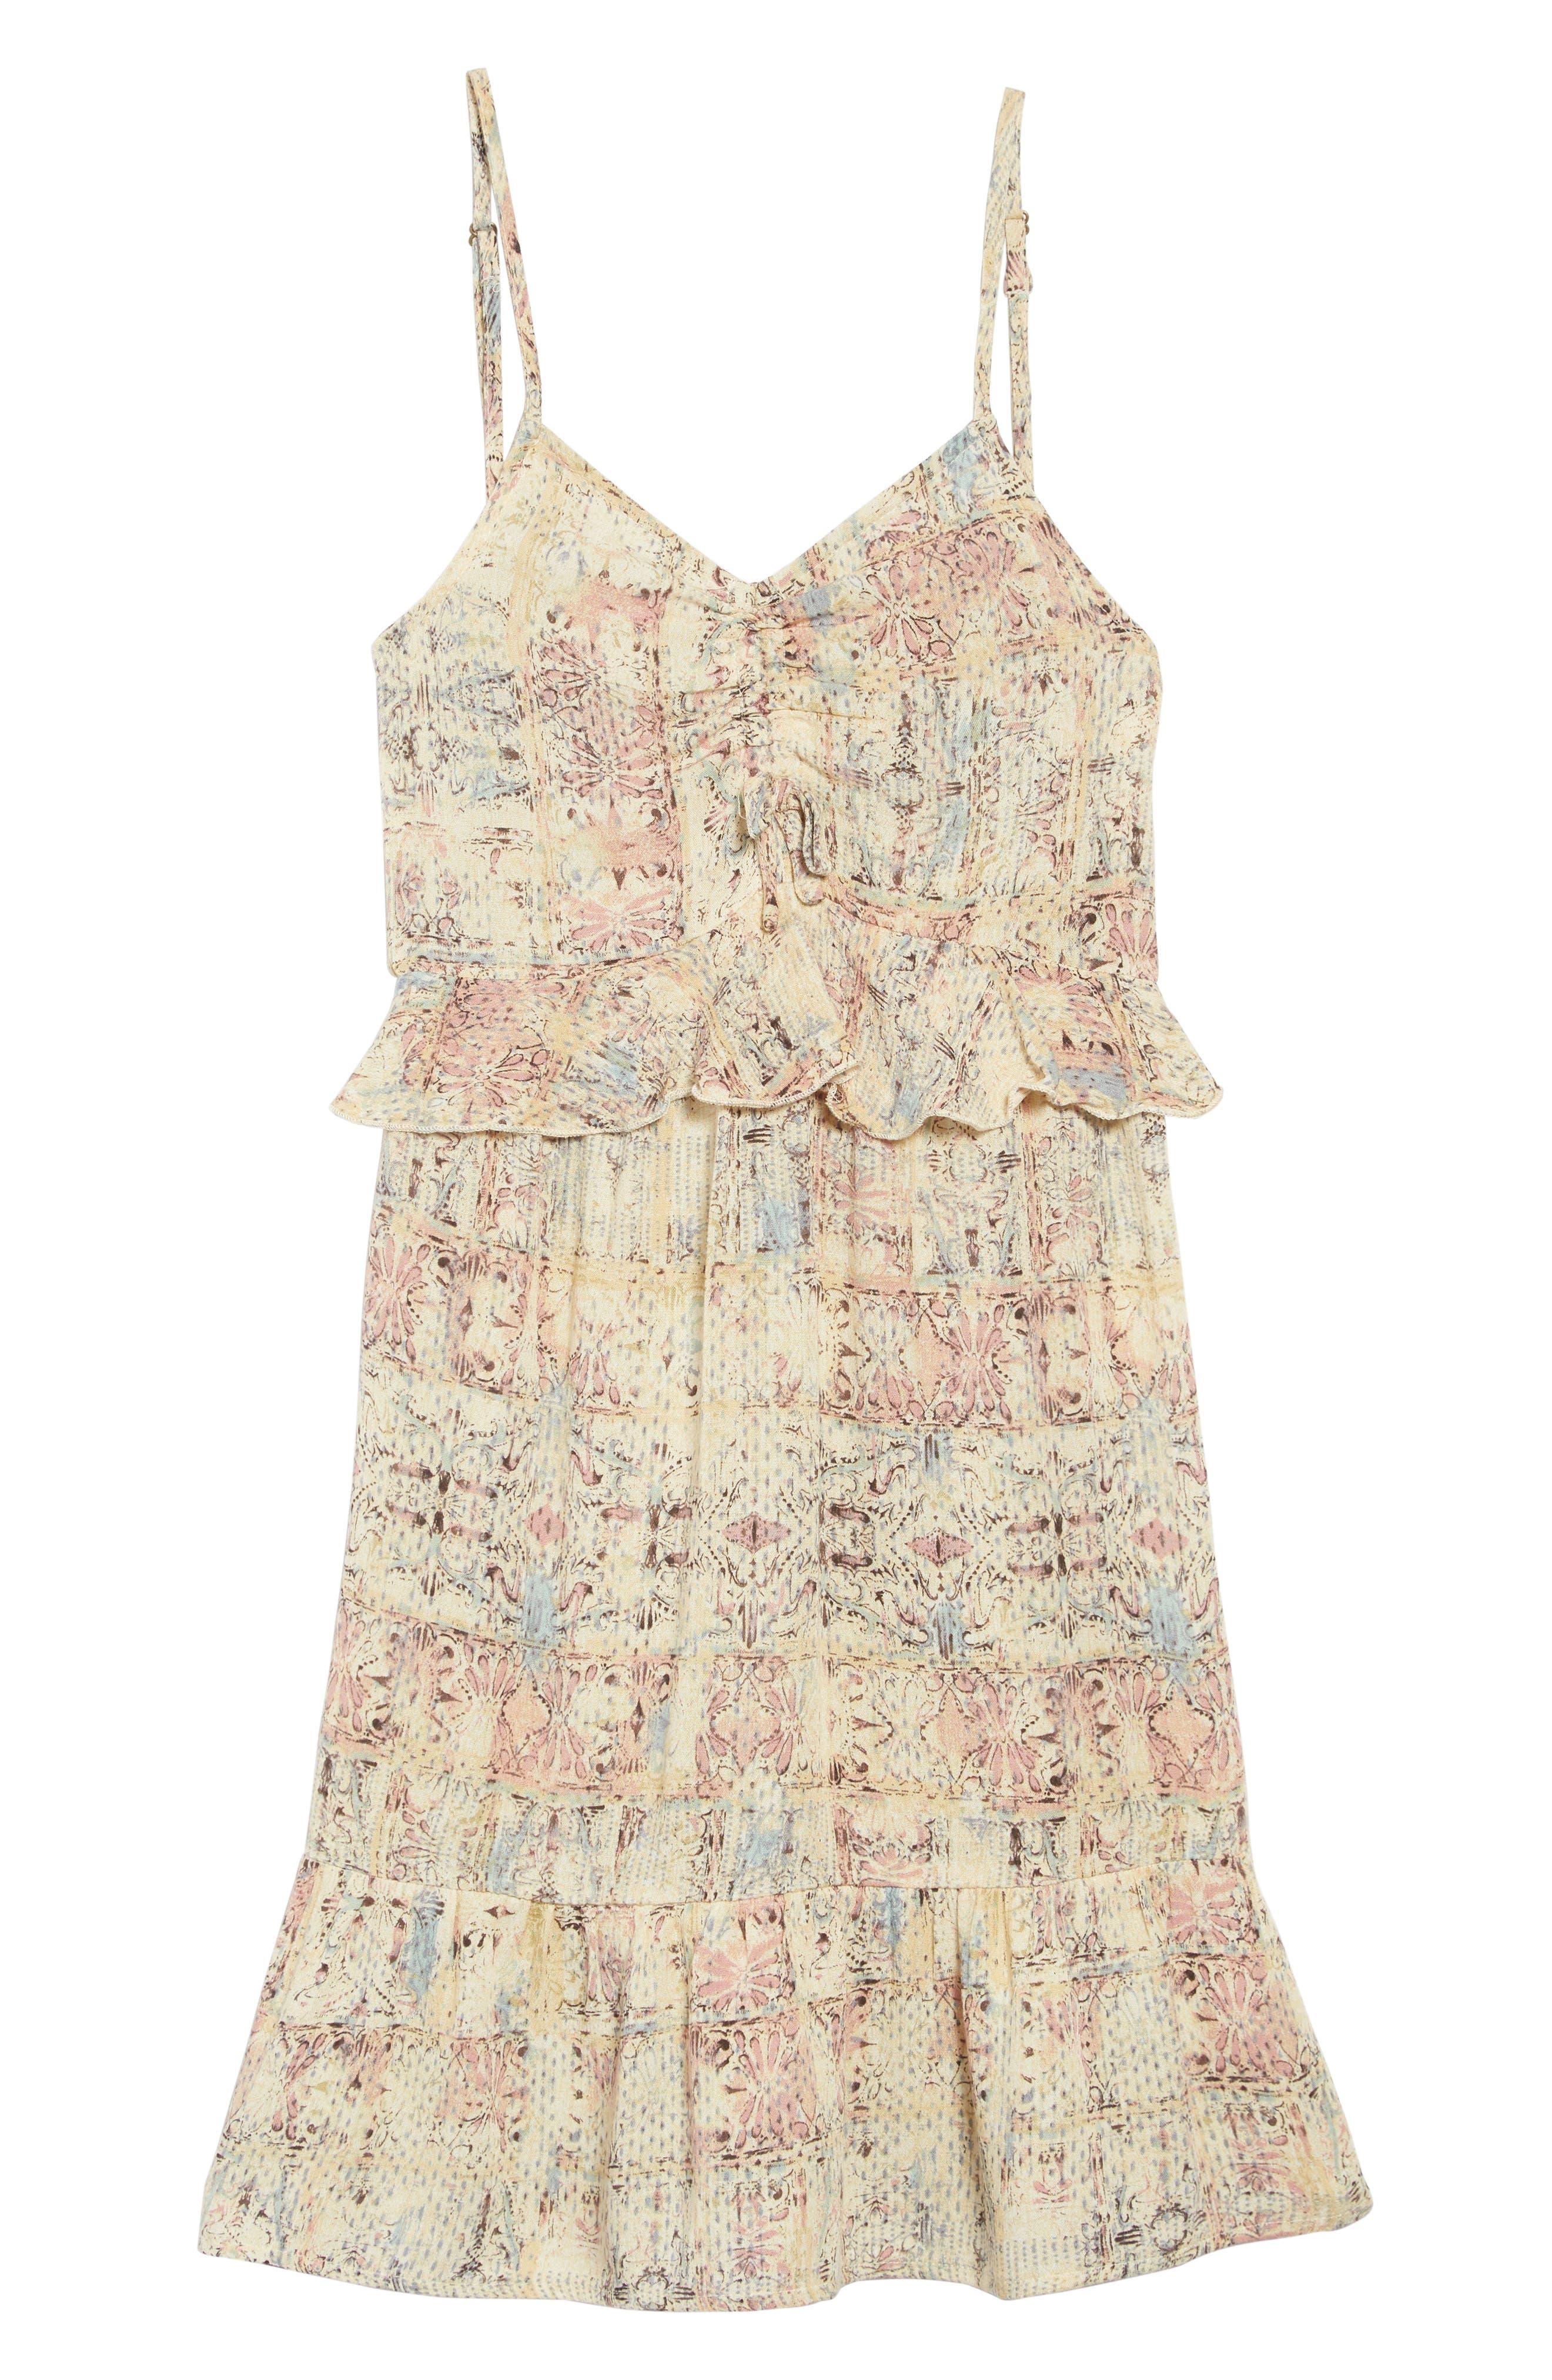 O'NEILL, Lithia Peplum High/Low Dress, Main thumbnail 1, color, 994